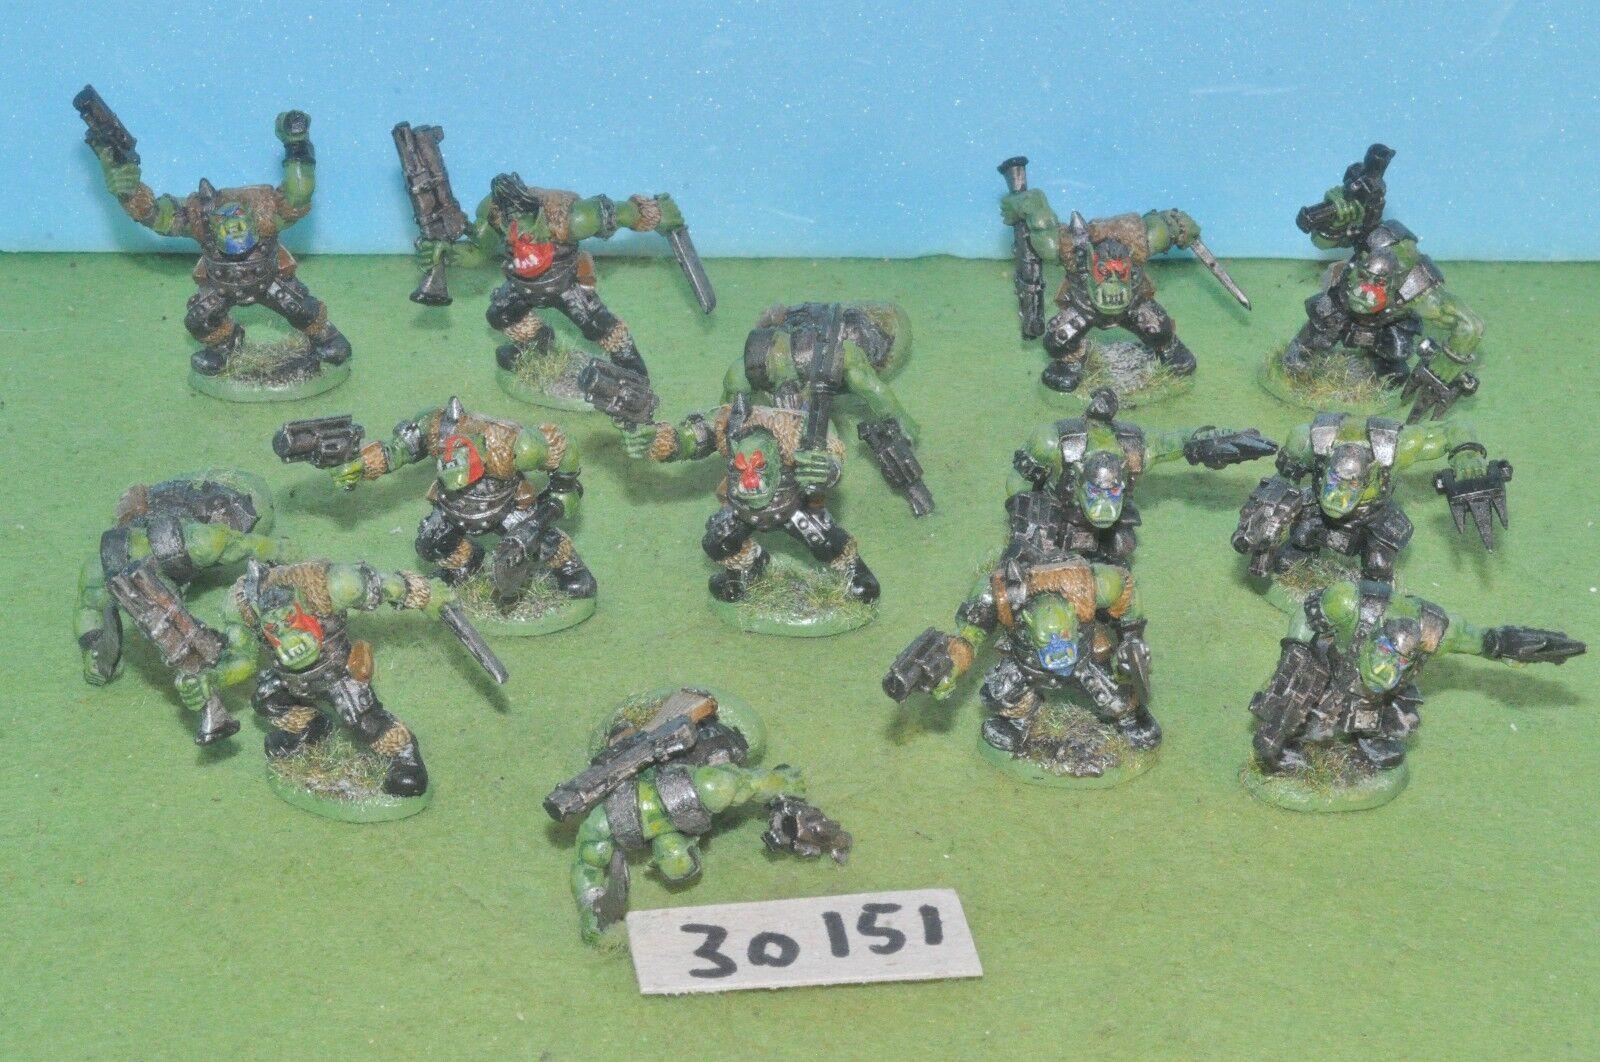 14 14 14 Orc Boys Gorka Morka 40k (30151) WARHAMMER e899a6